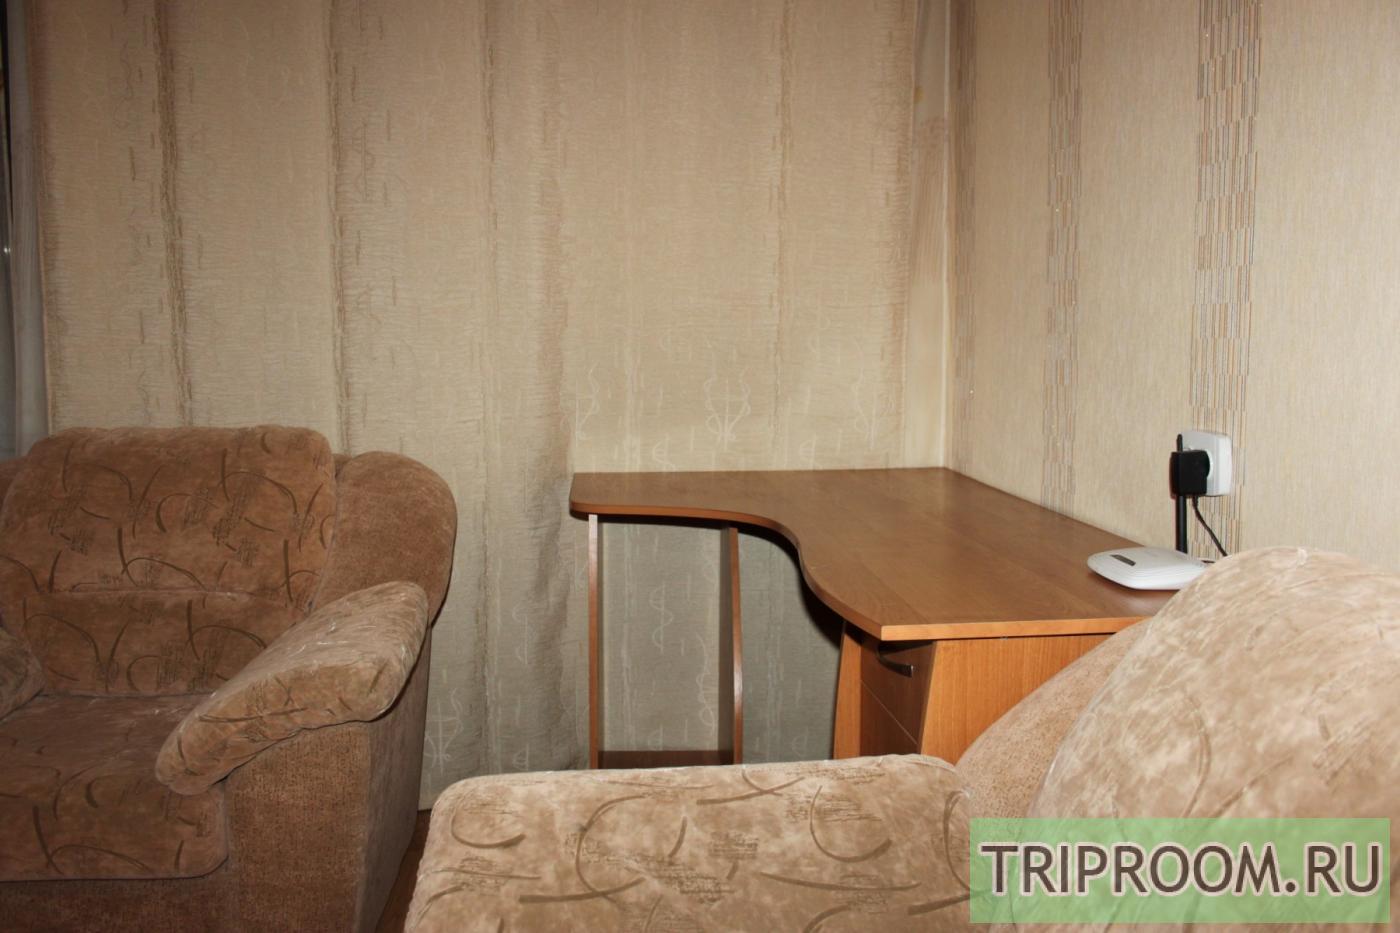 1-комнатная квартира посуточно (вариант № 6675), ул. Победы бульвар, фото № 9